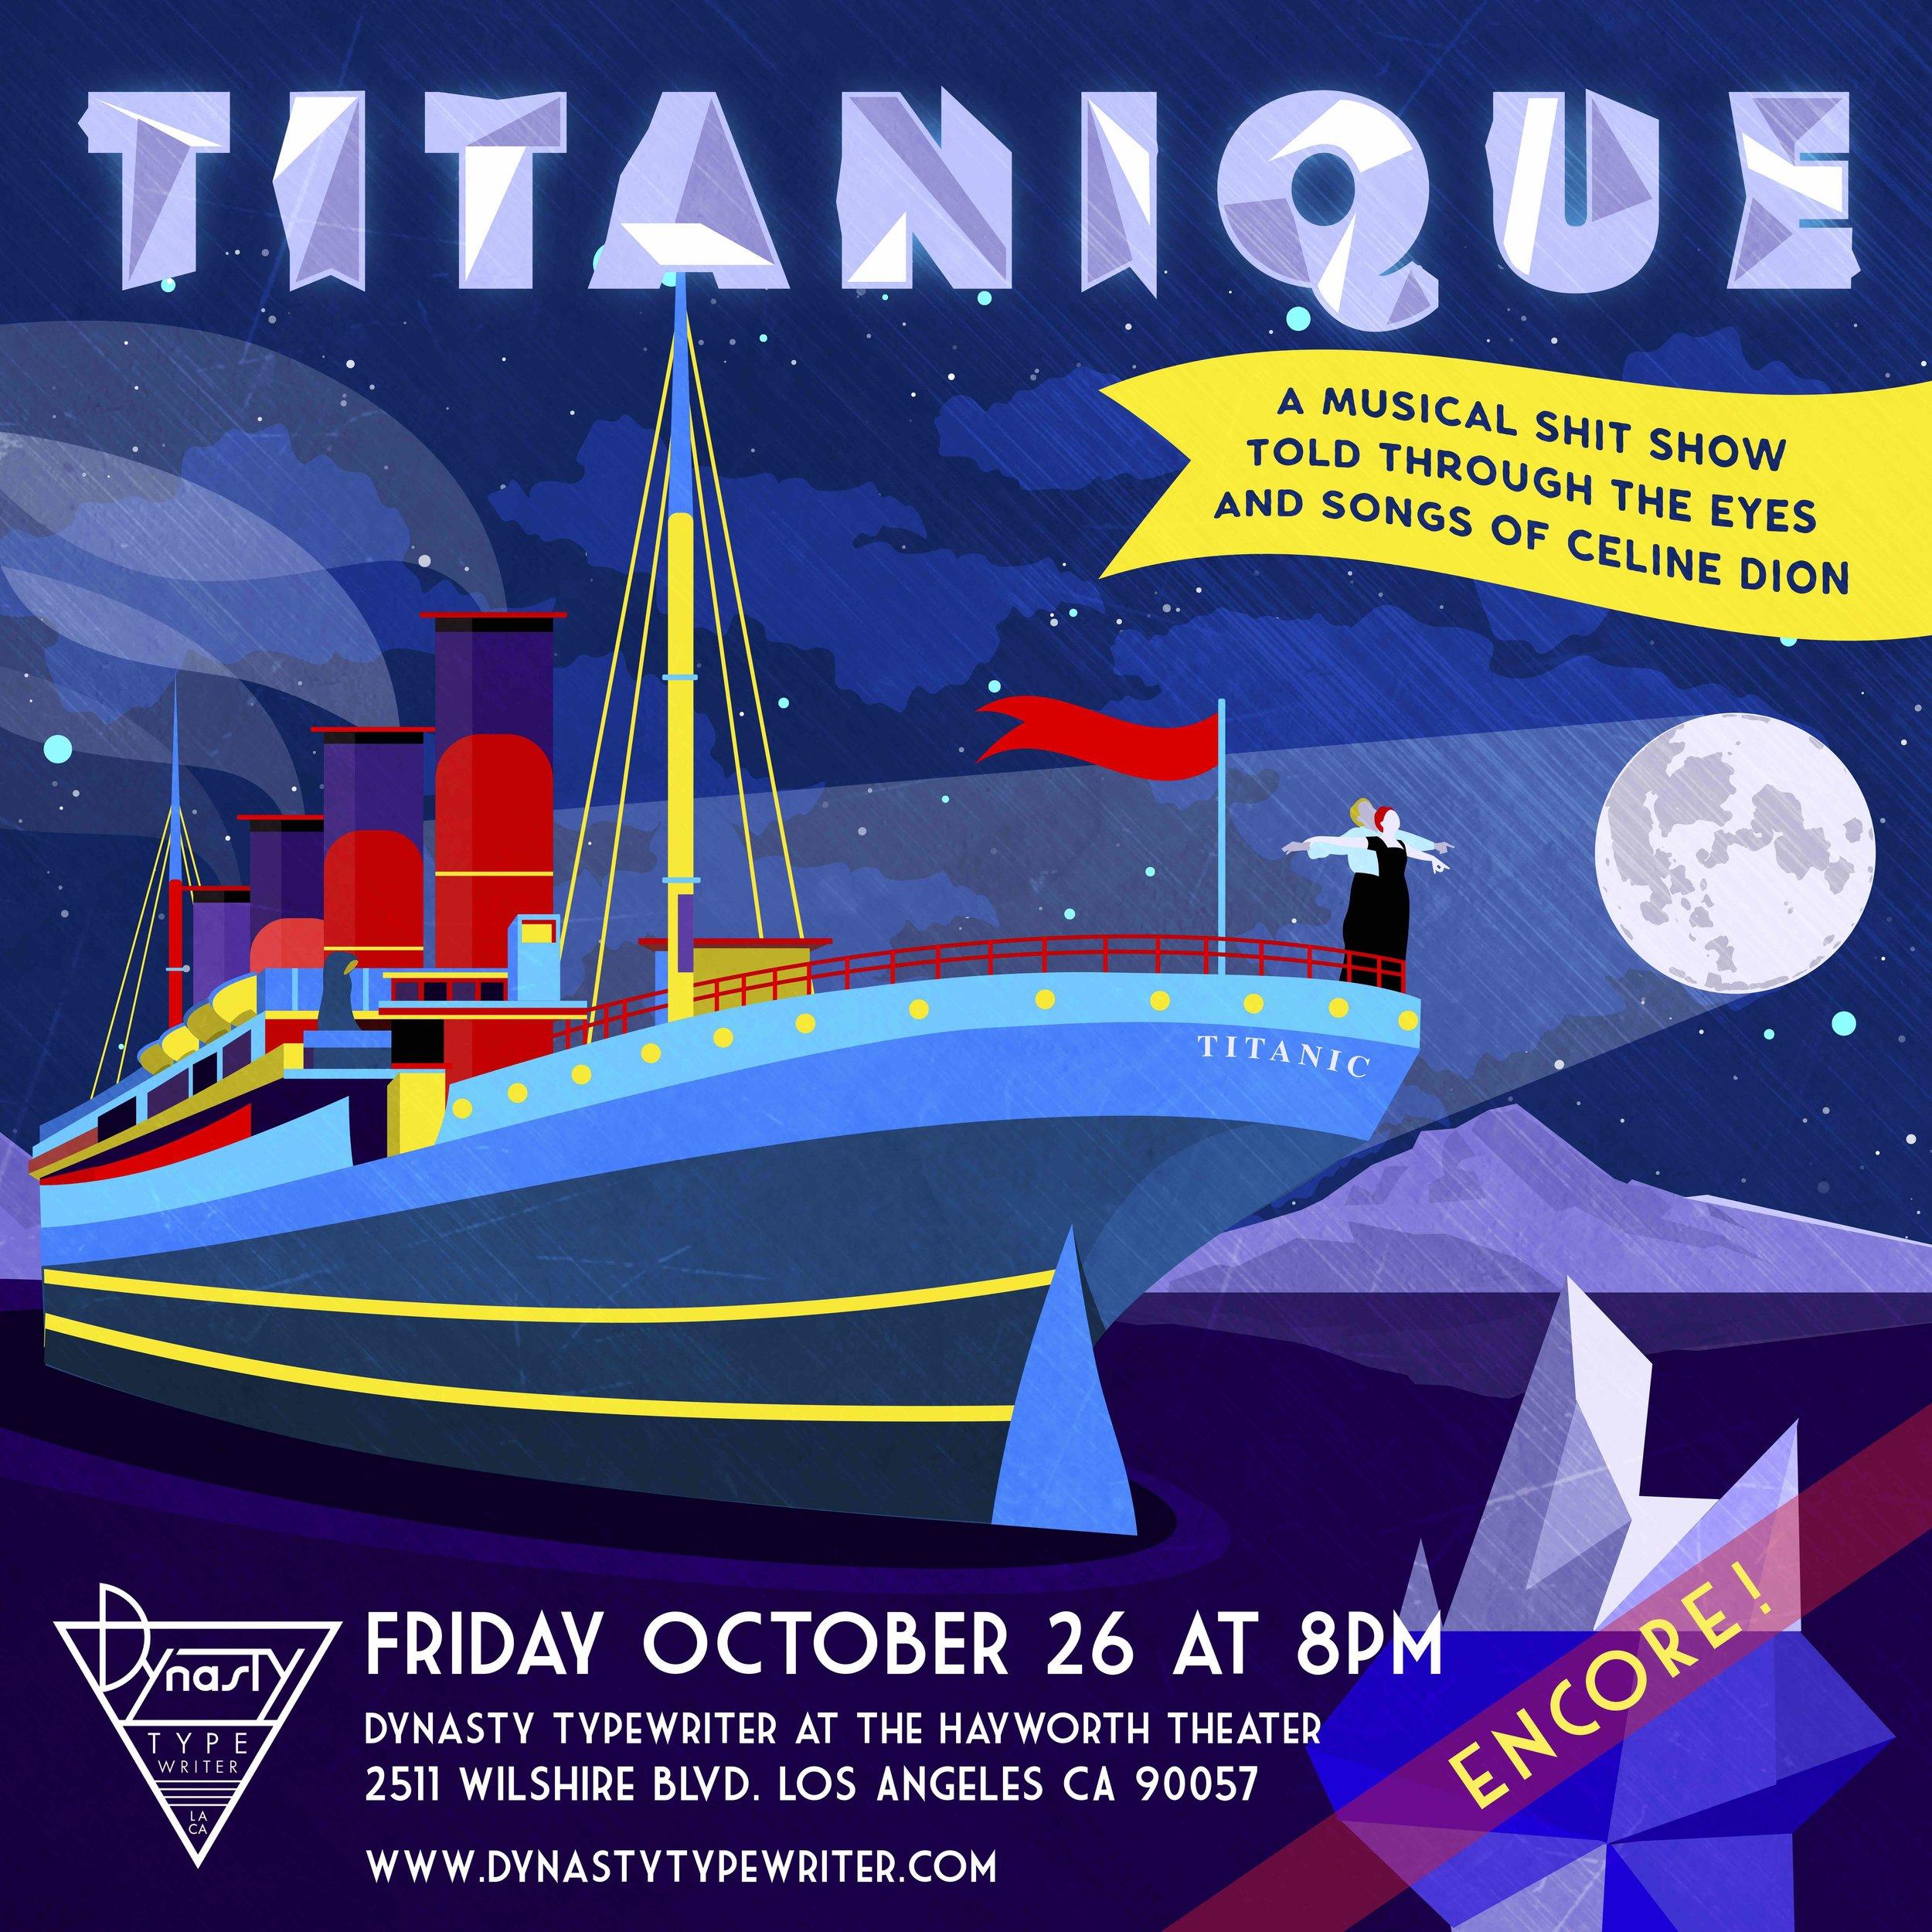 titanique Oct 26th banner encore.jpg